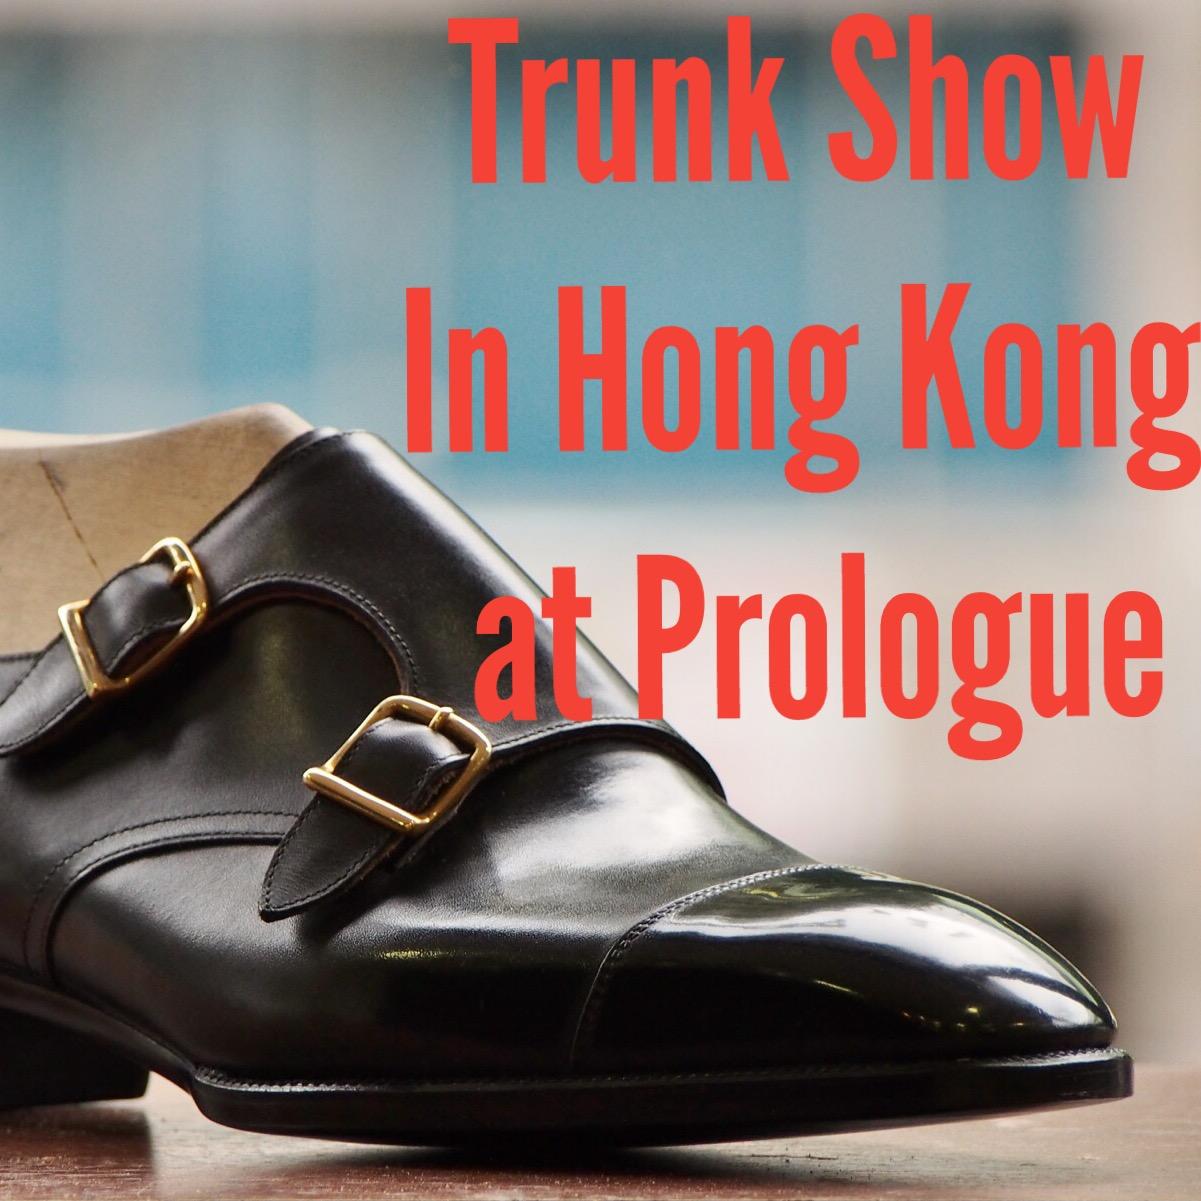 Trunk Show in Hong Kong_b0170577_1552131.jpg